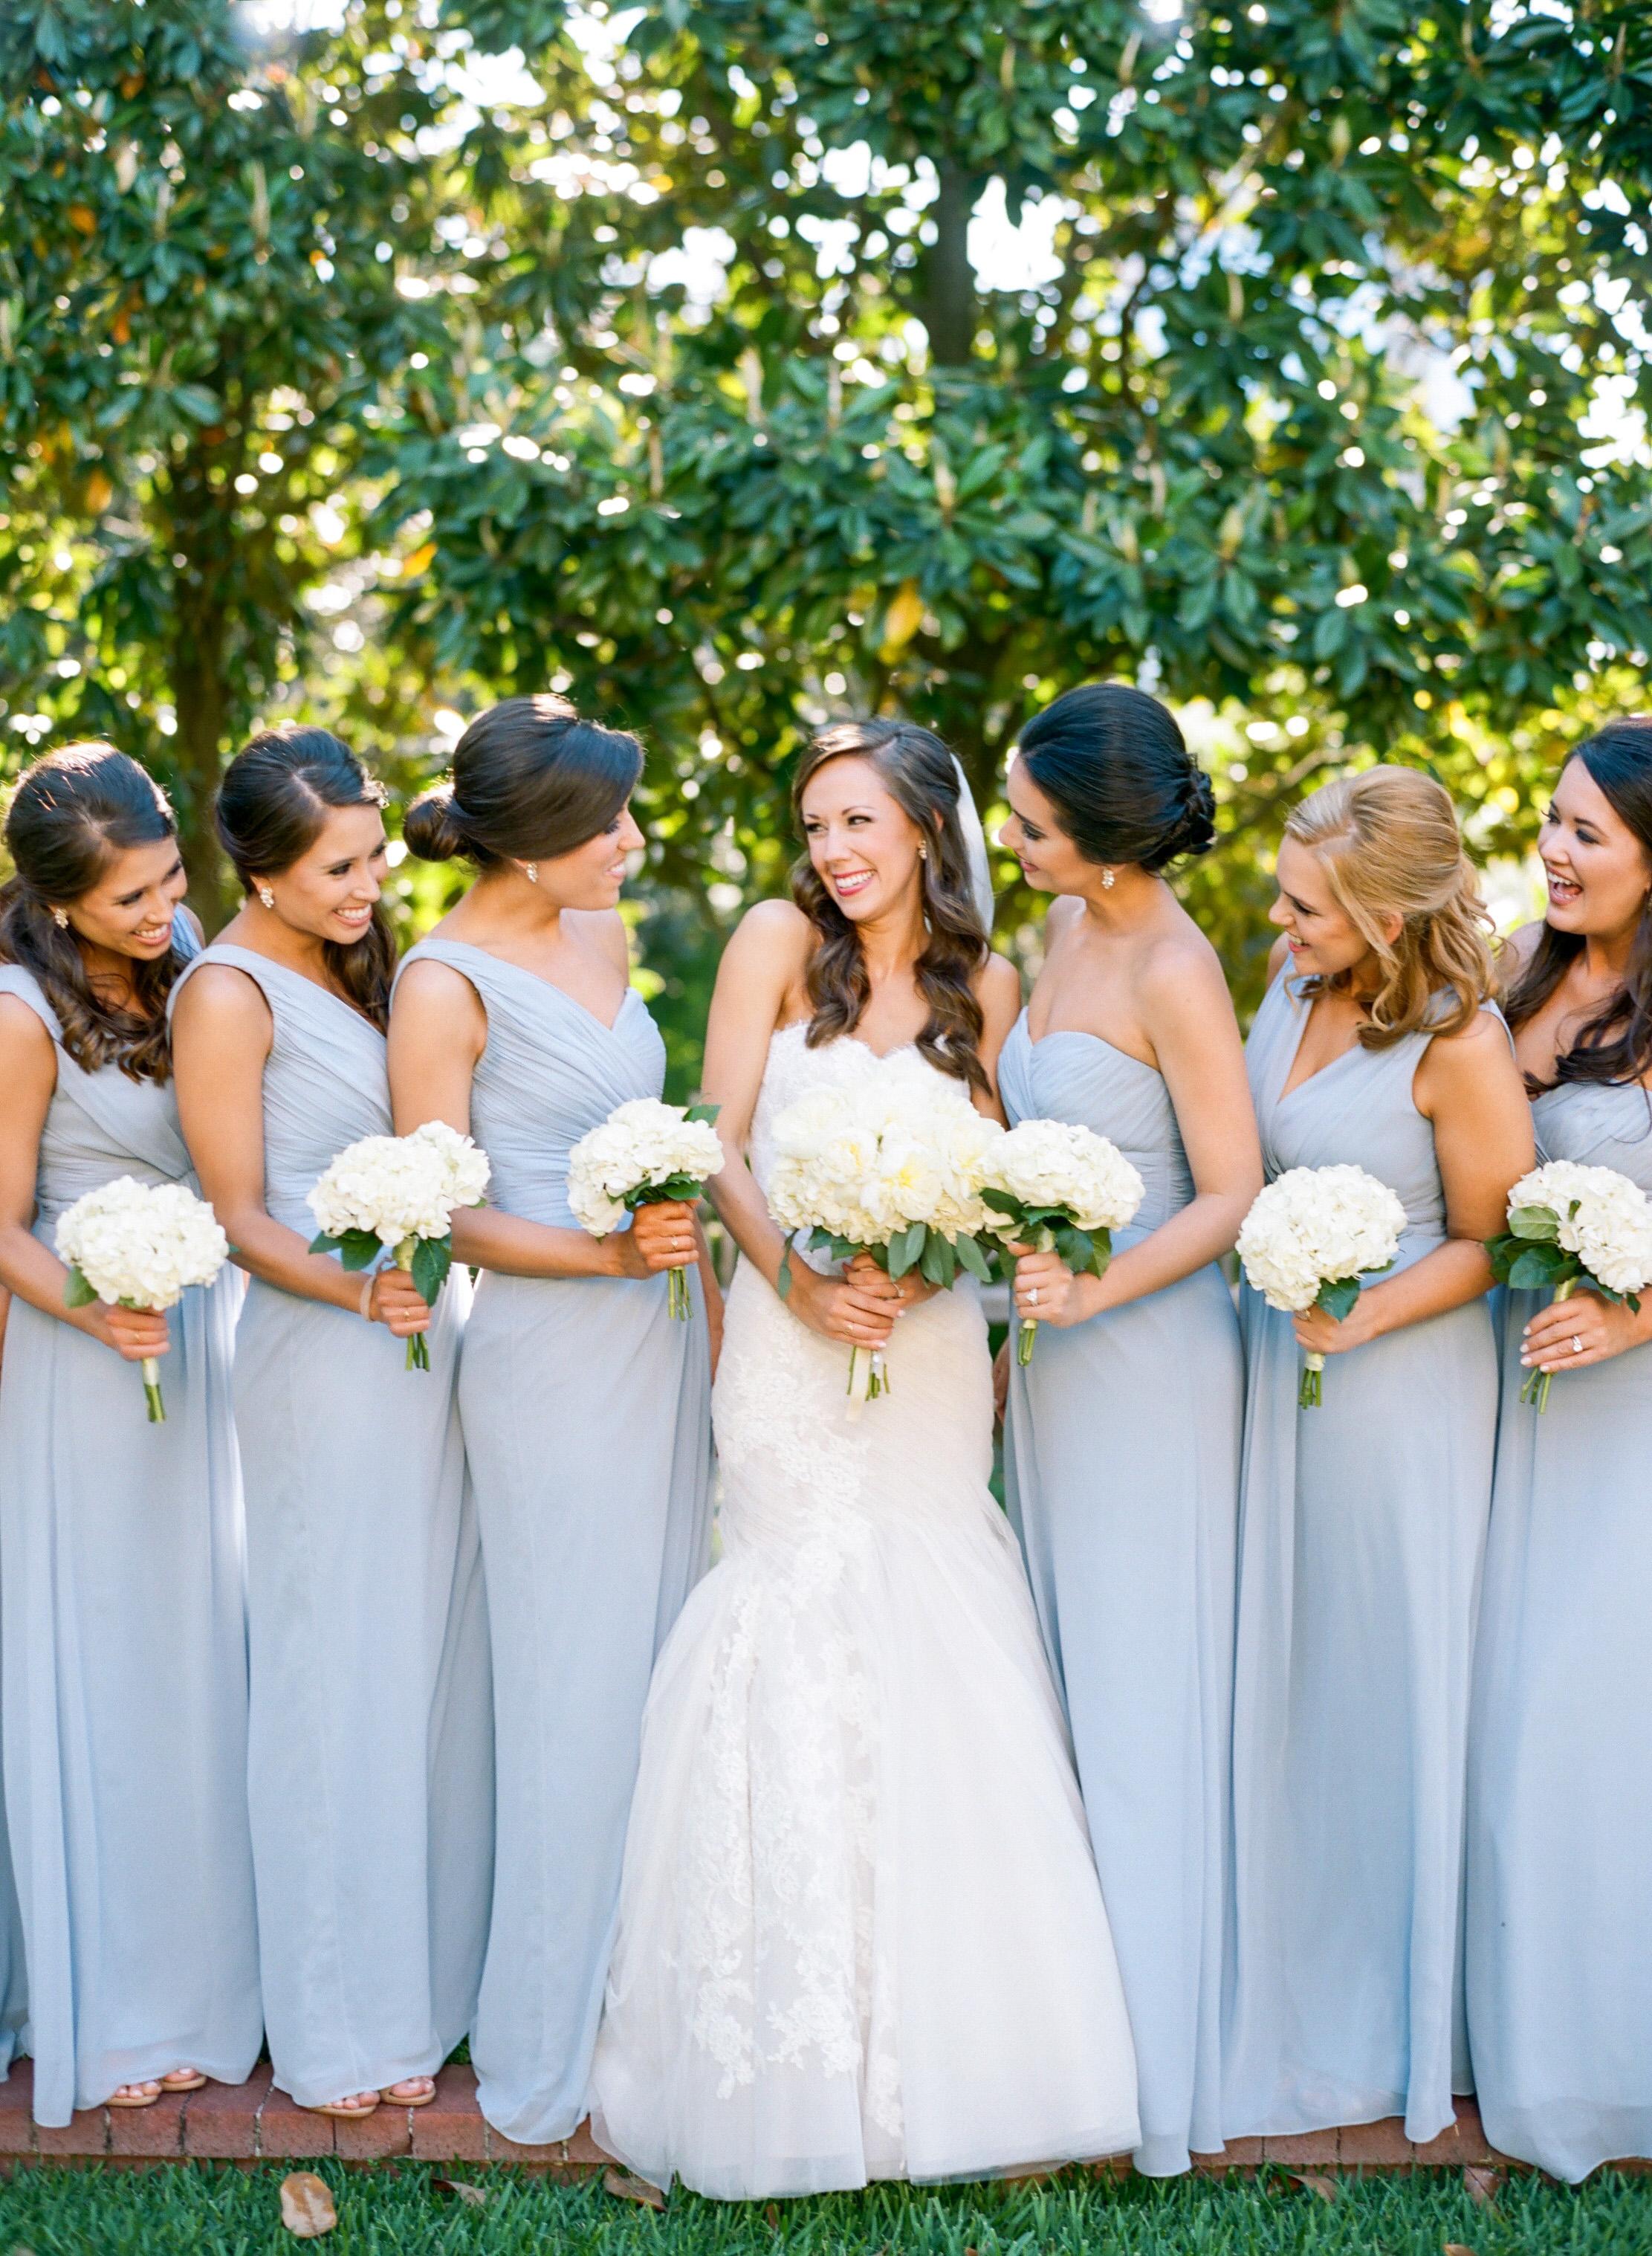 St.-Philip-Presbyterian-Church-Houston-Wedding-Ceremony-The-Junior-League-Of-Houston-Reception-Dana-Fernandez-Photography-Fine-Art-Film-14.jpg